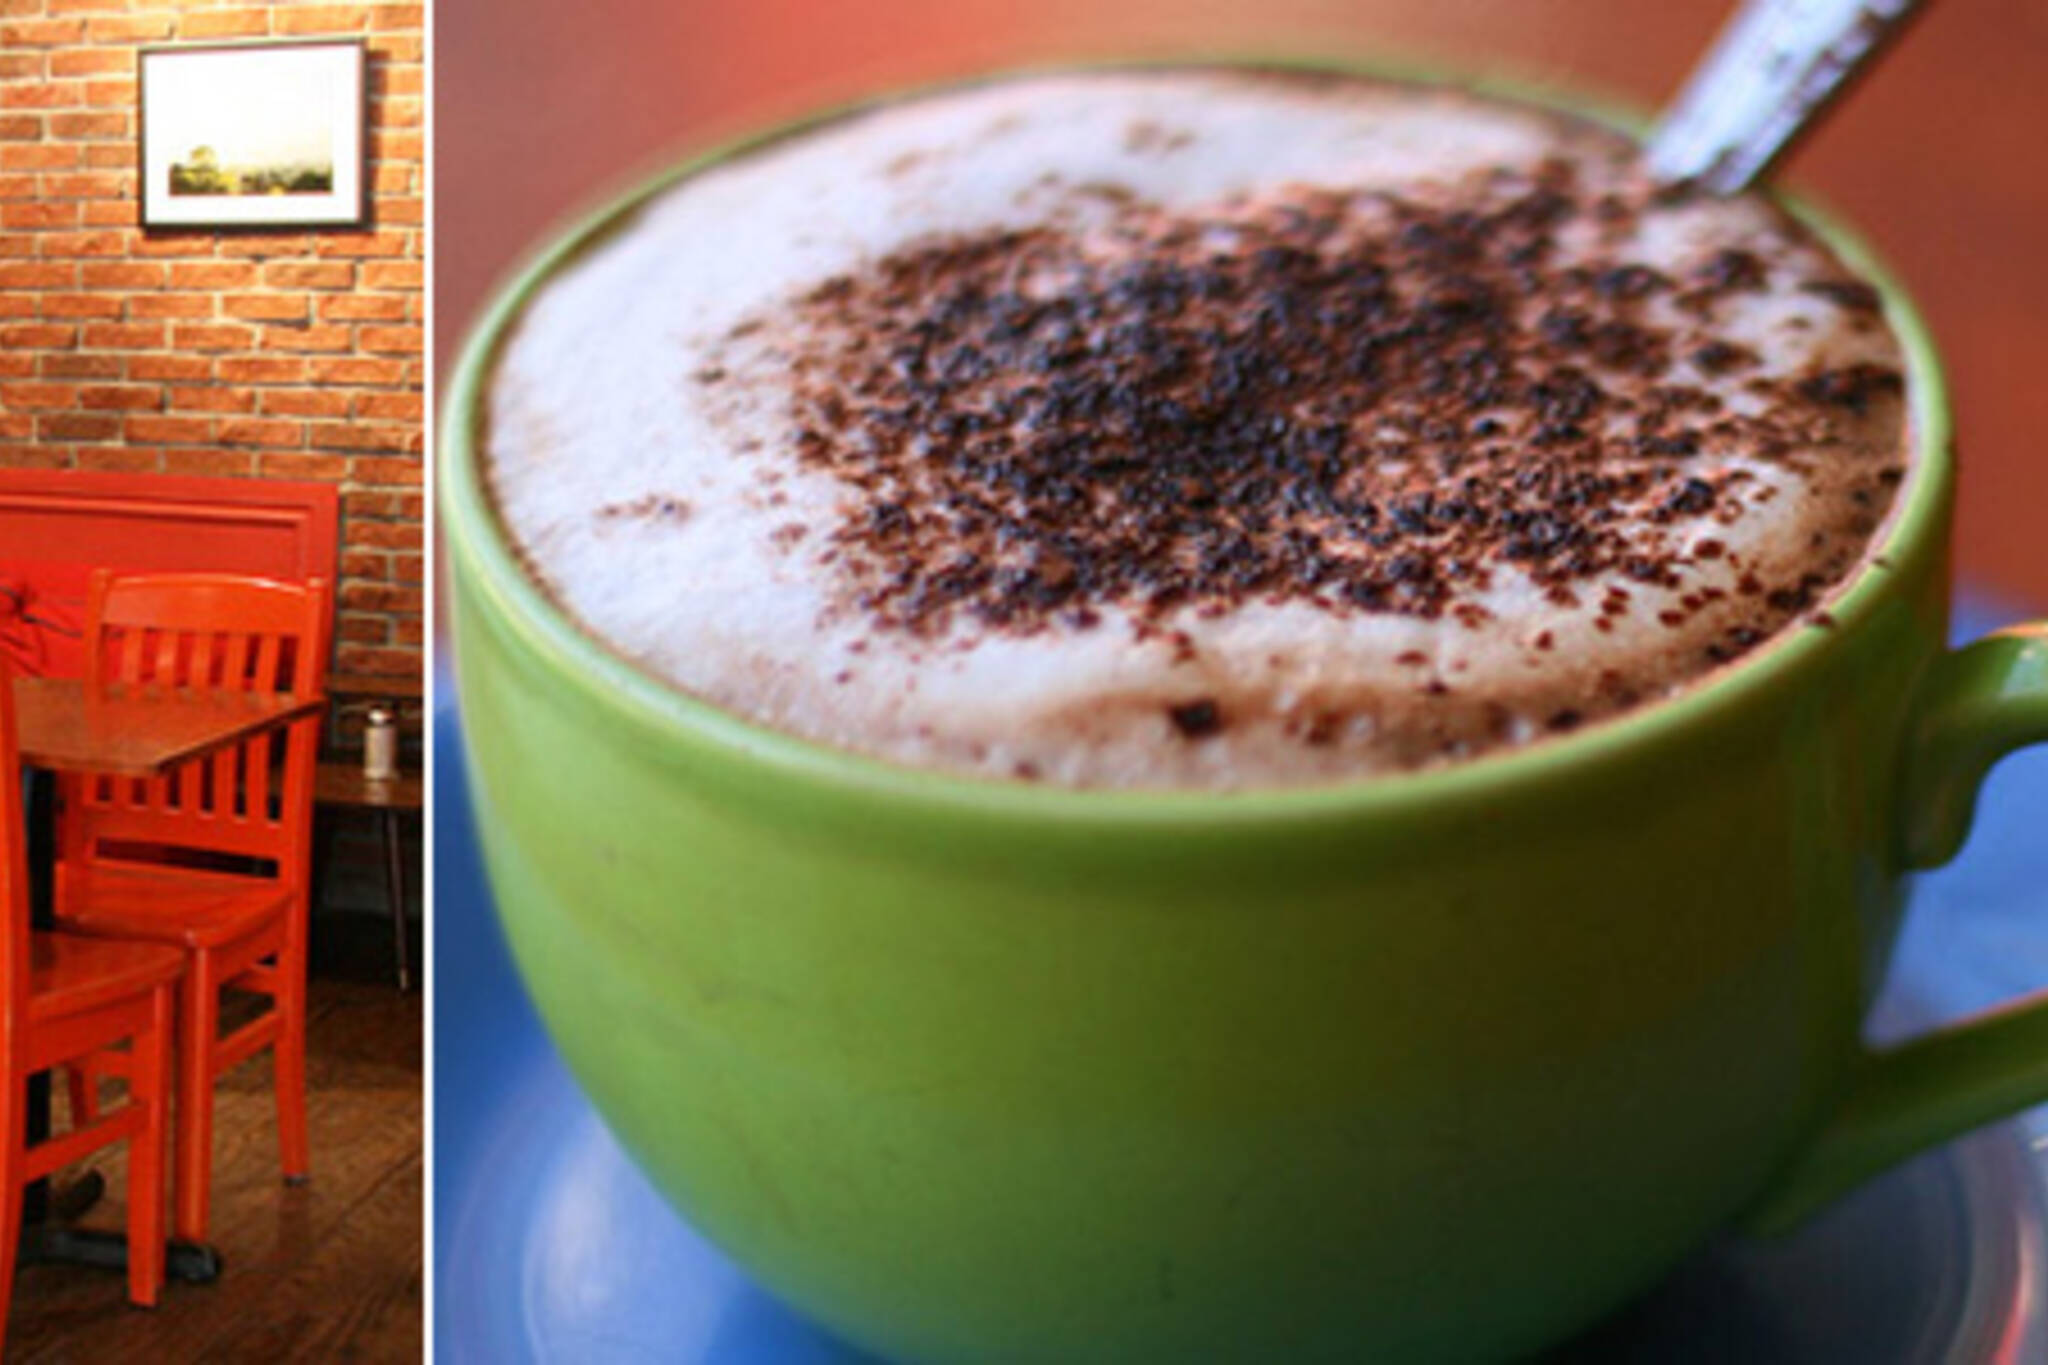 Tinto Coffee House